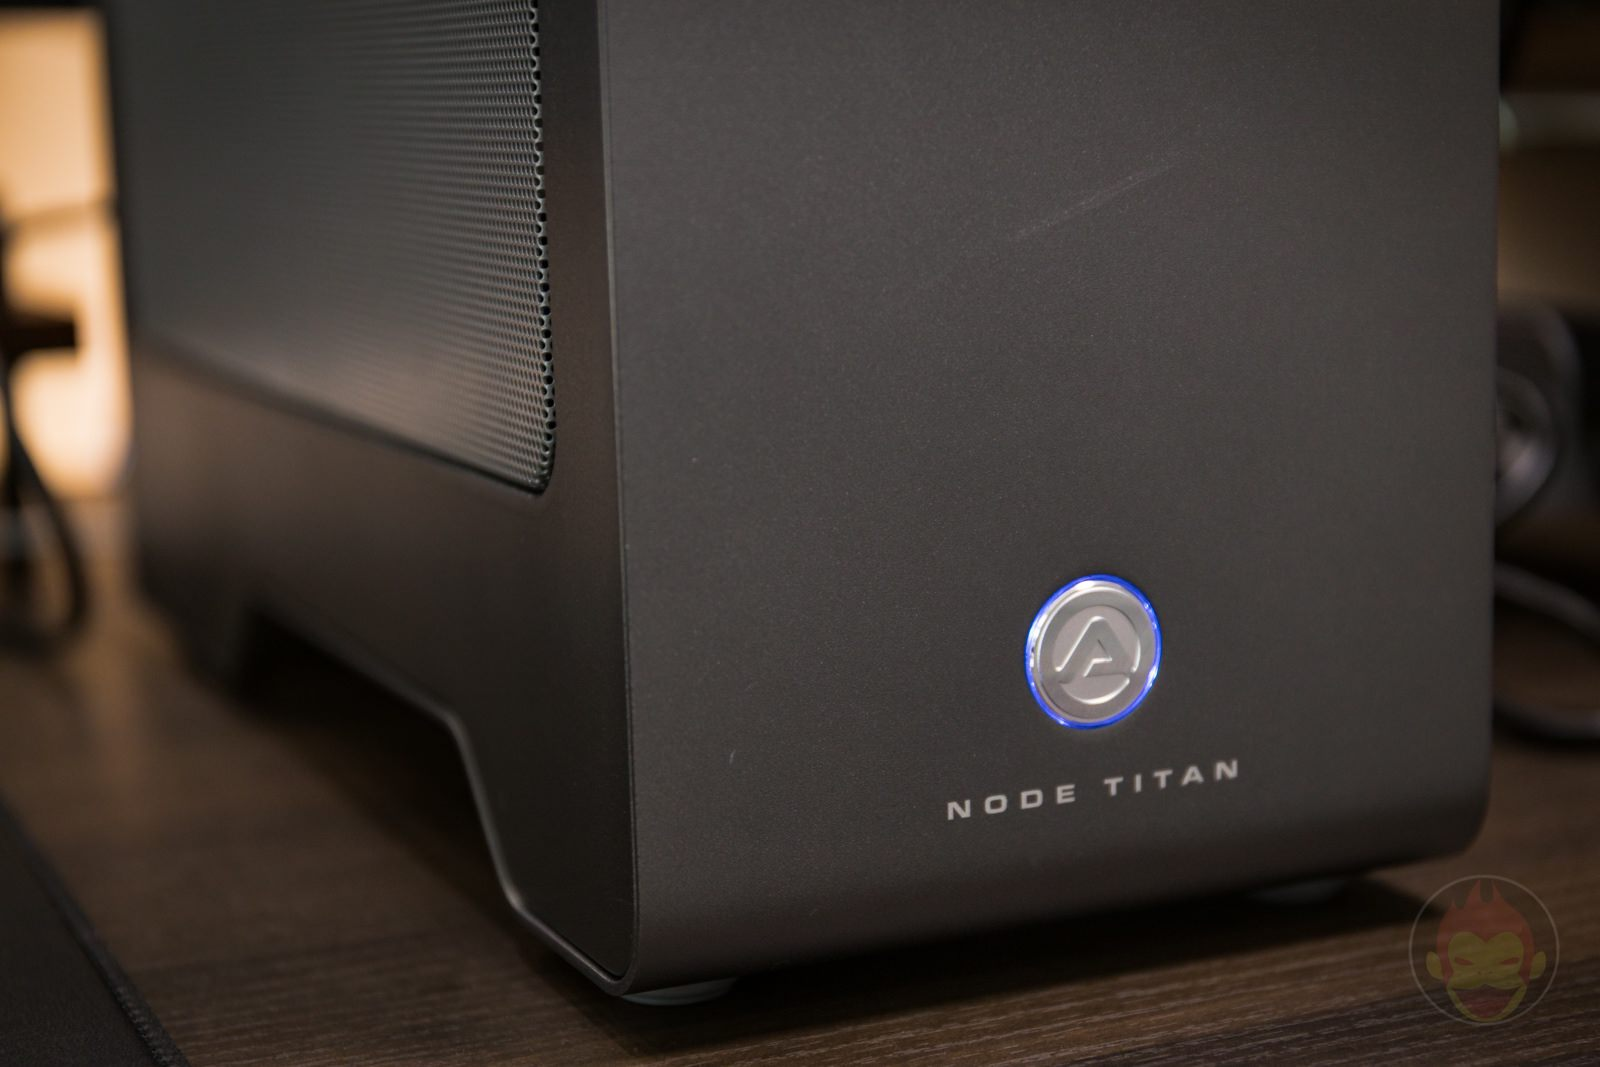 AKiTiO Node Titan with msi AMD Radeon RX 5700 XT Review 32